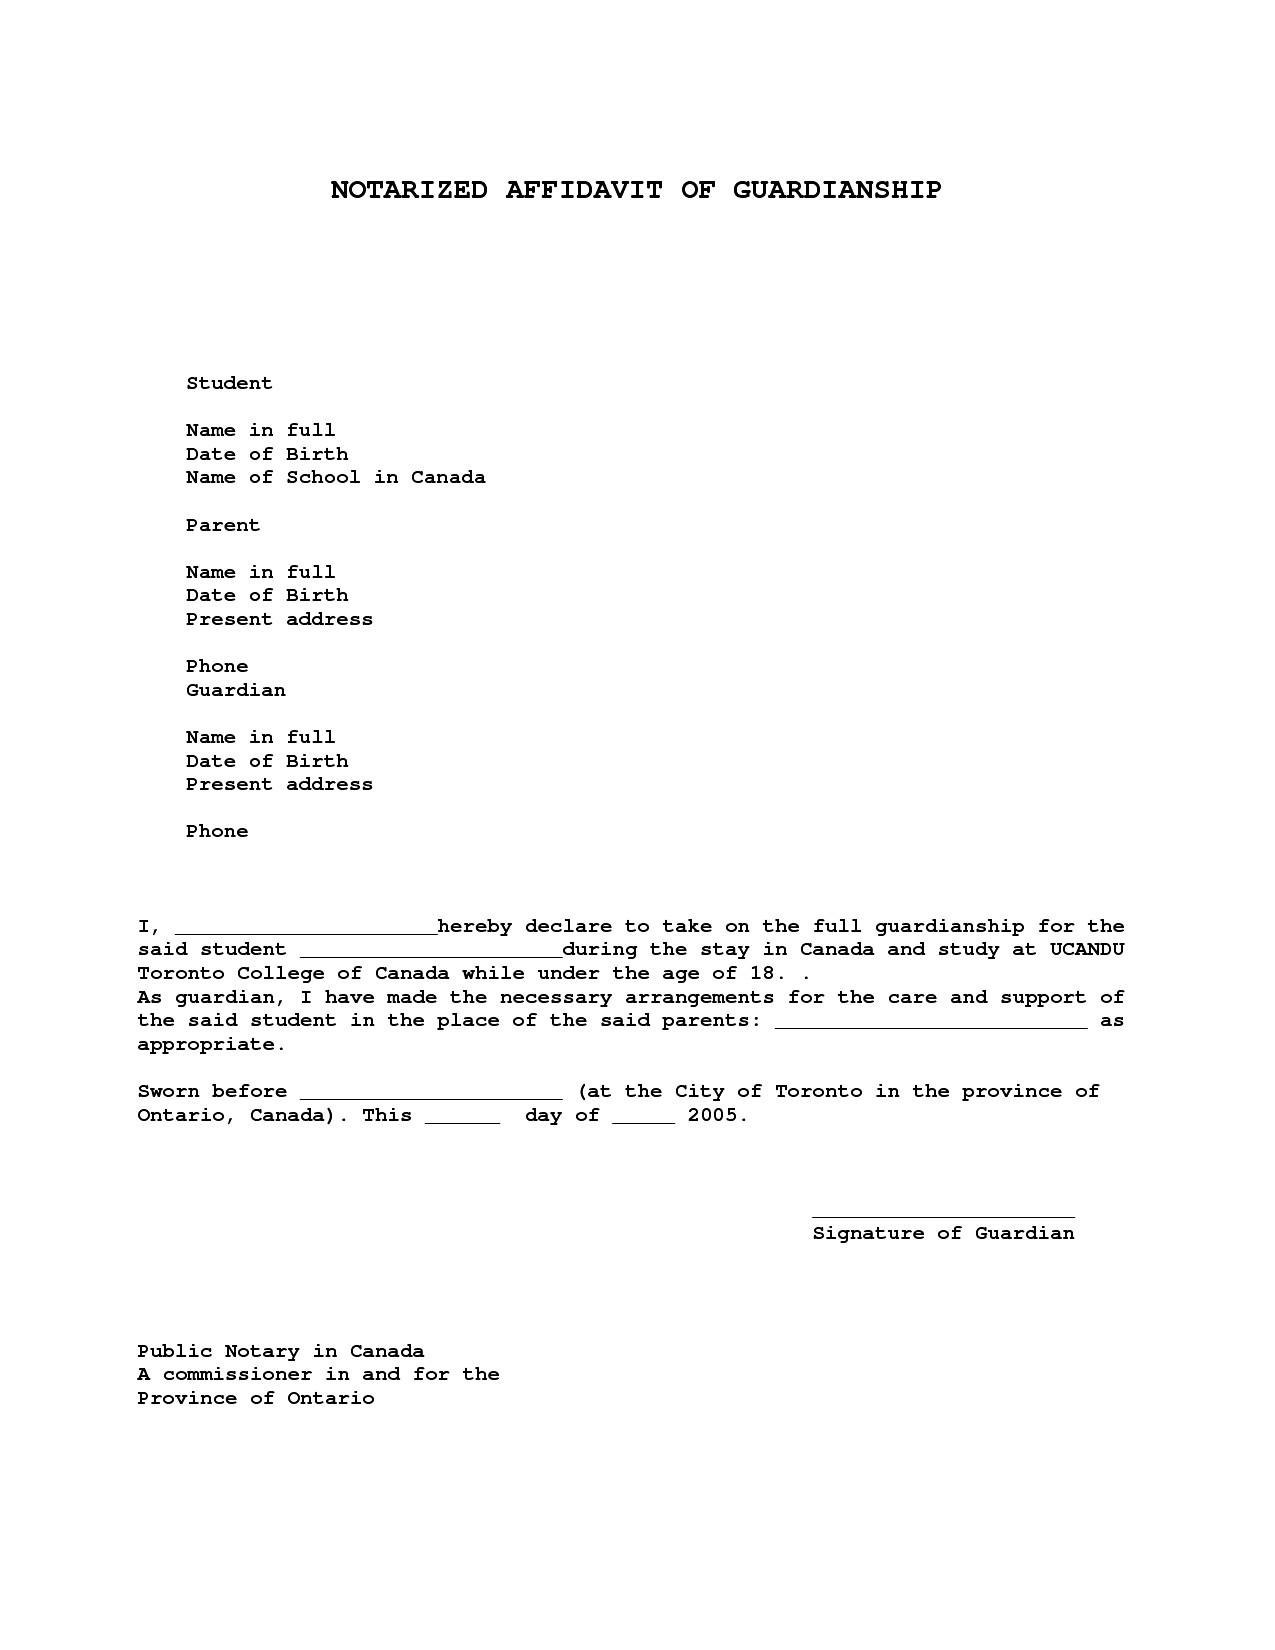 Notarized Letter for Guardianship Template - Sample Guardianship Letter Unique Nice Temporary Guardianship Letter